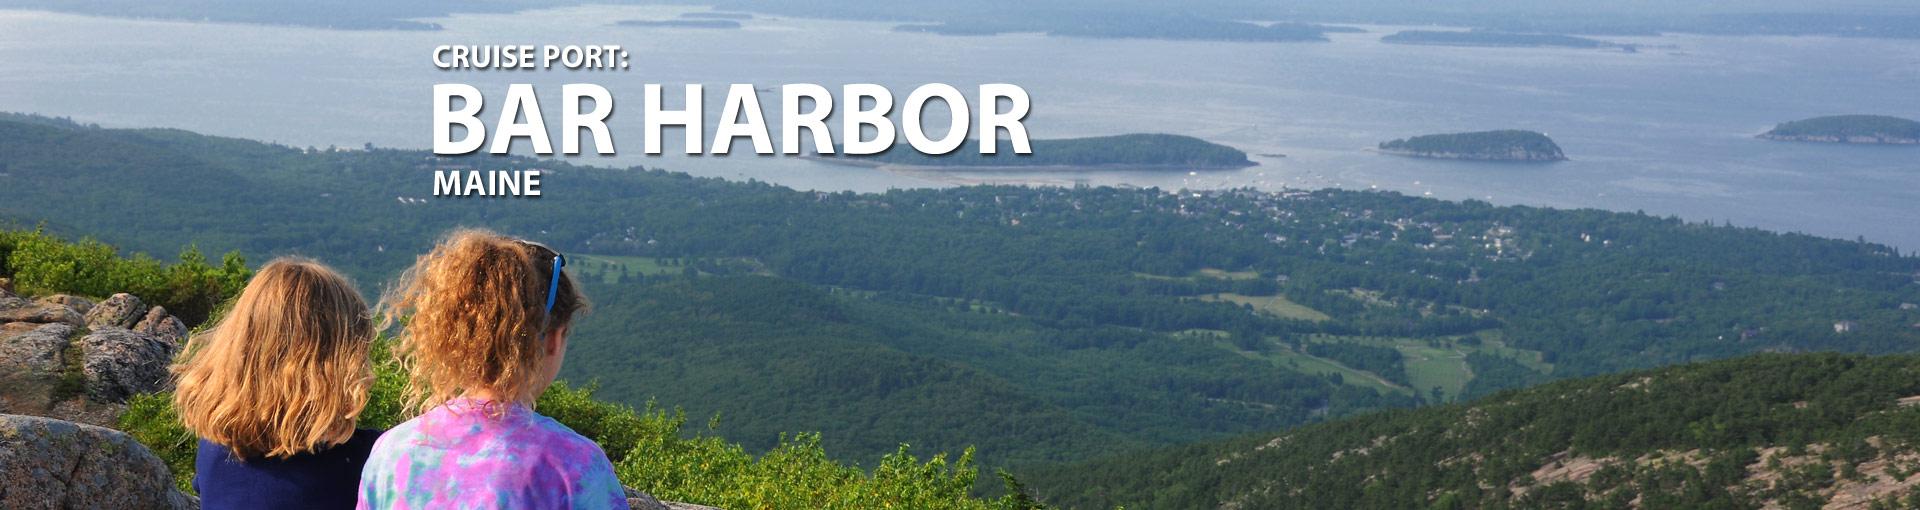 Cruise Port: Bar Harbor, Maine